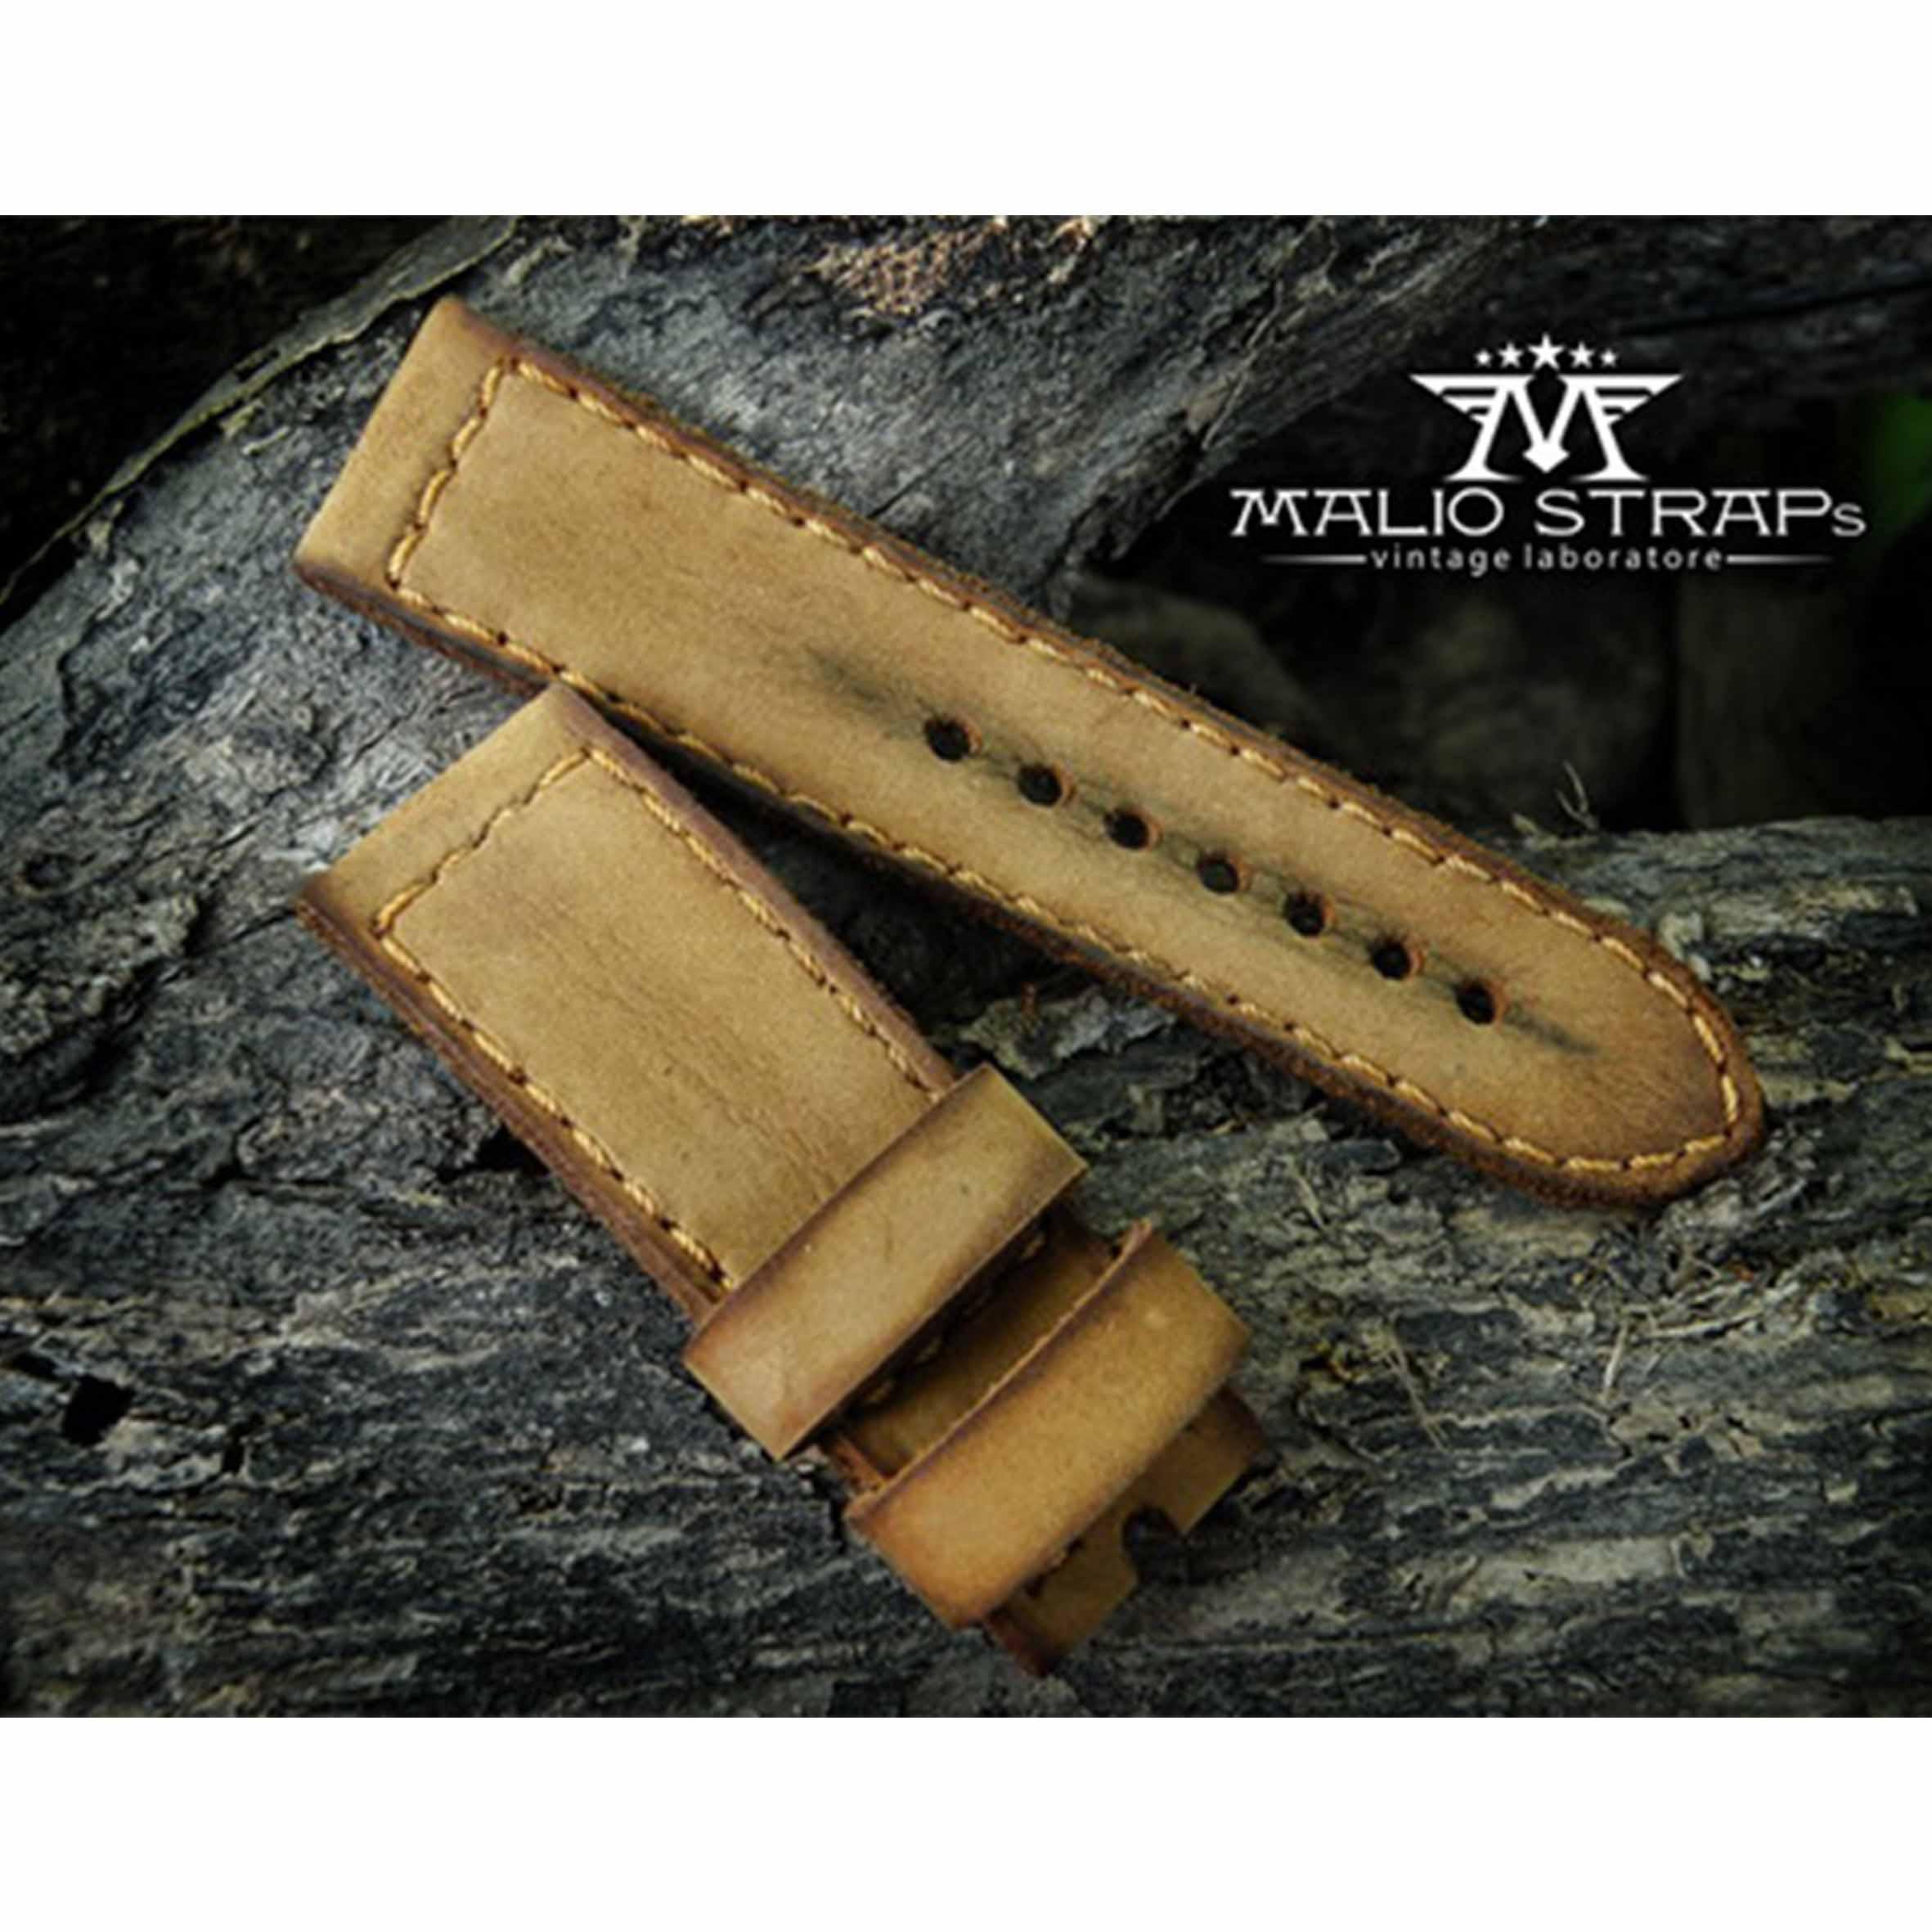 malio-straps-fango-strapsonly (1)